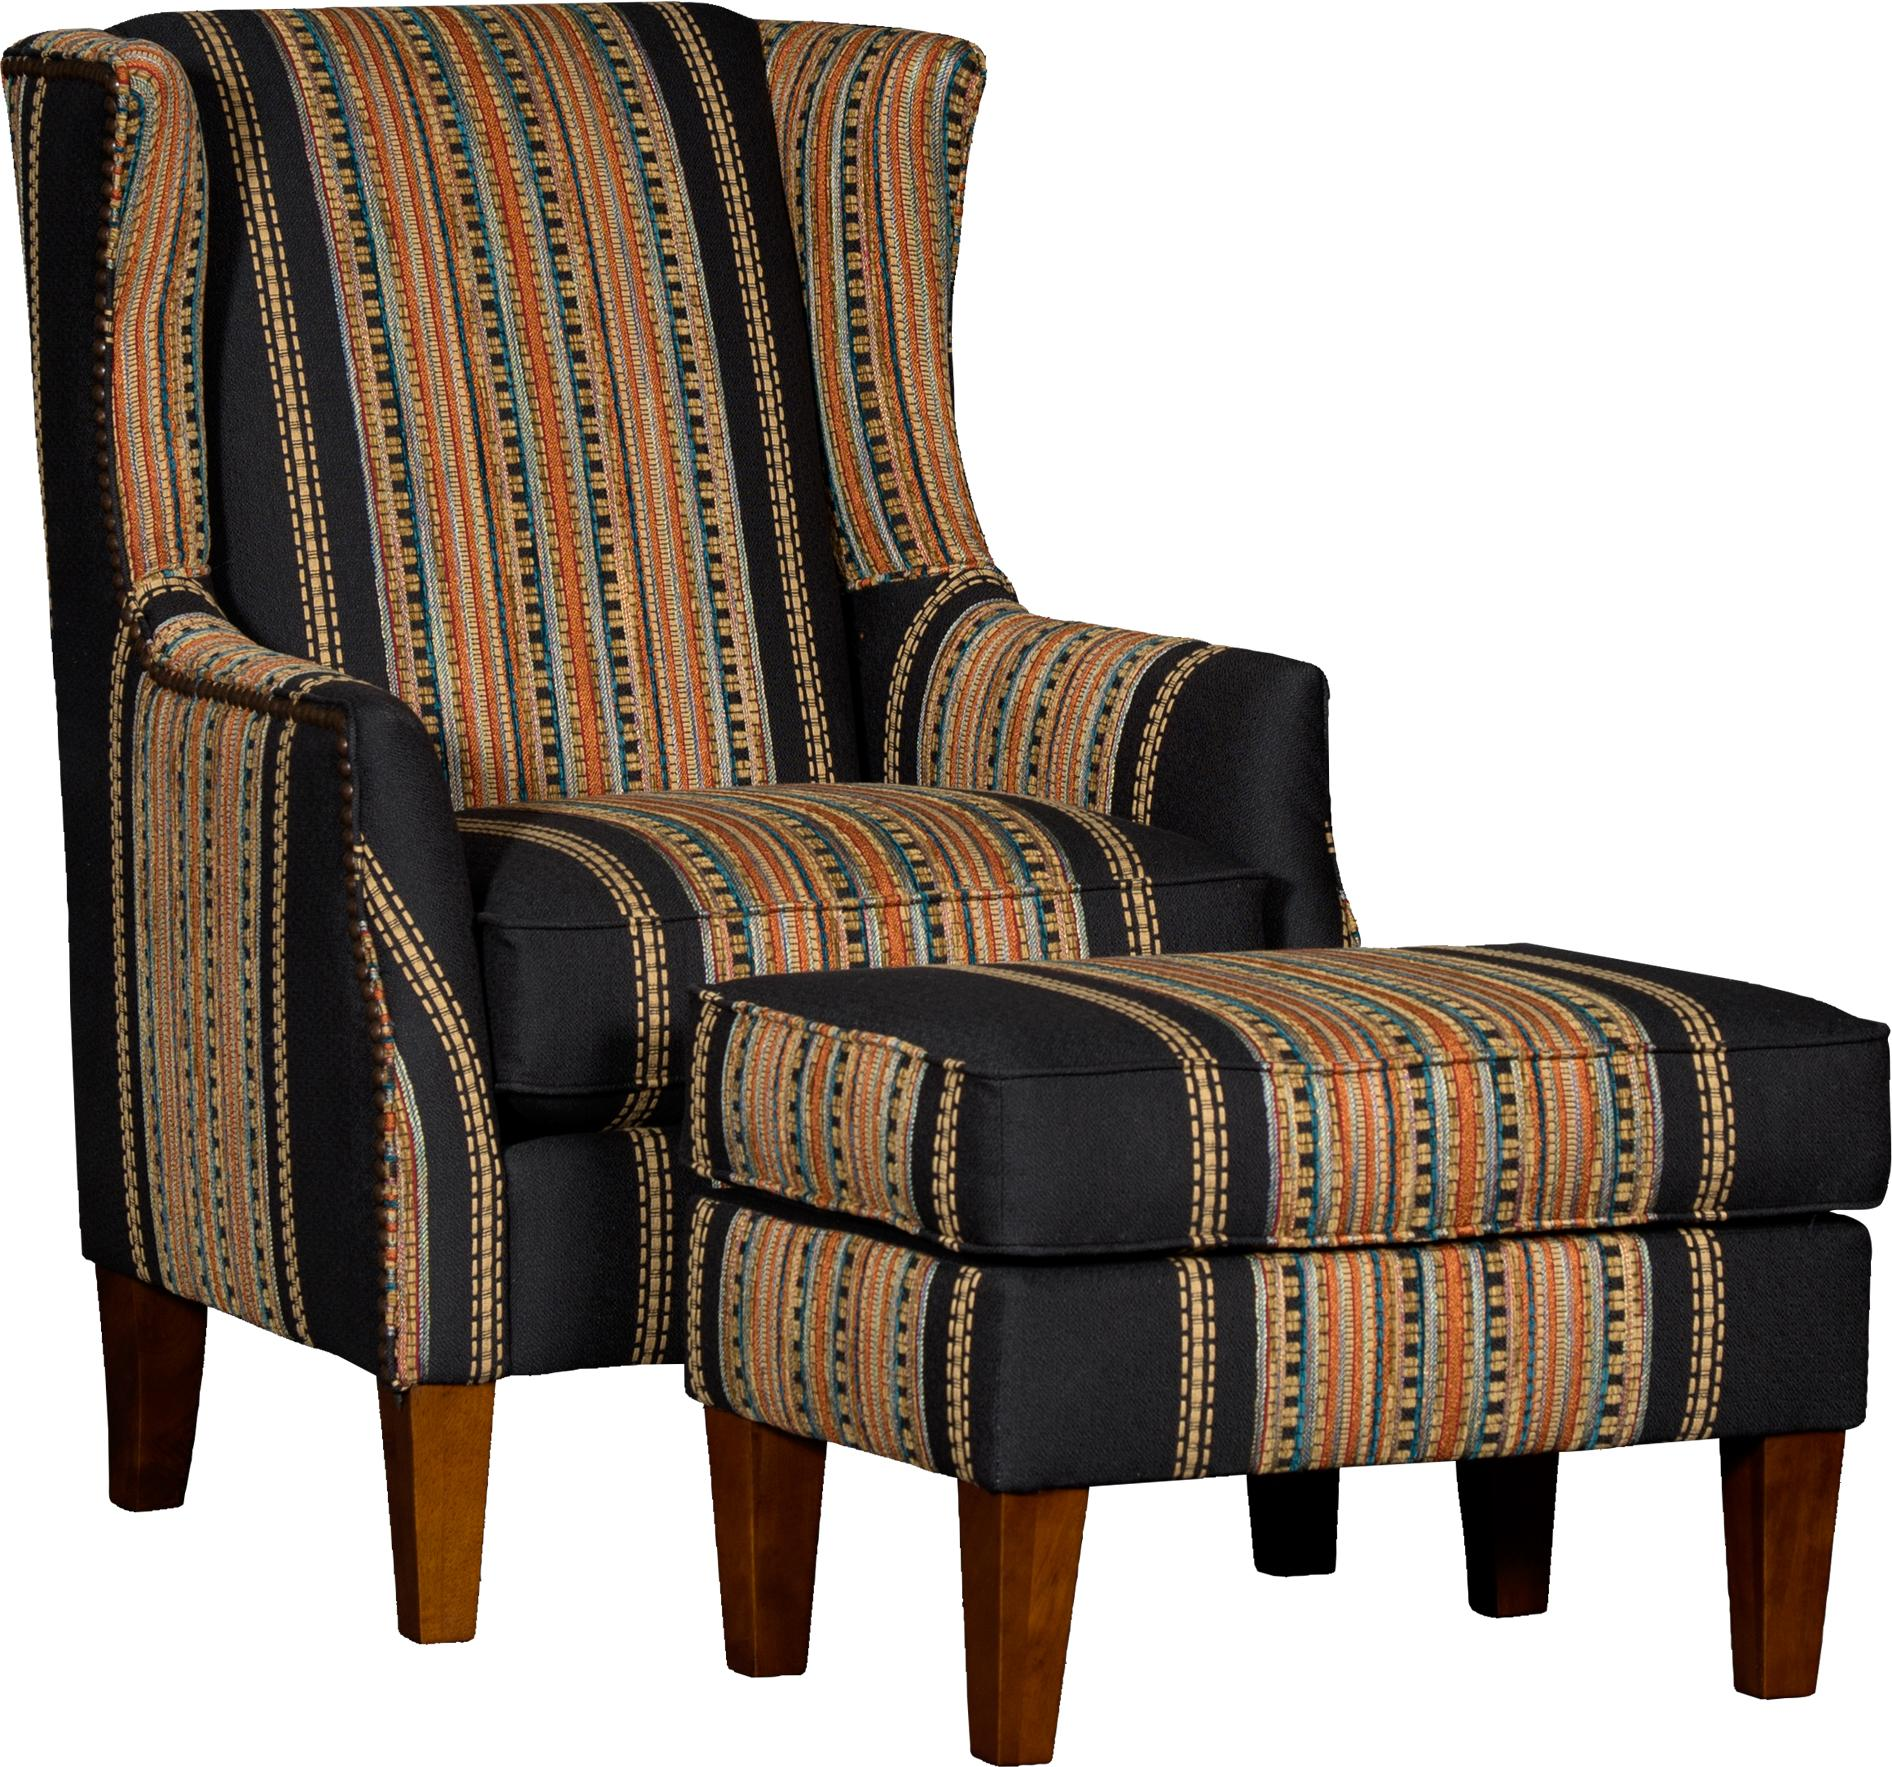 8840 Chair & Ottoman Set by Mayo at Pedigo Furniture